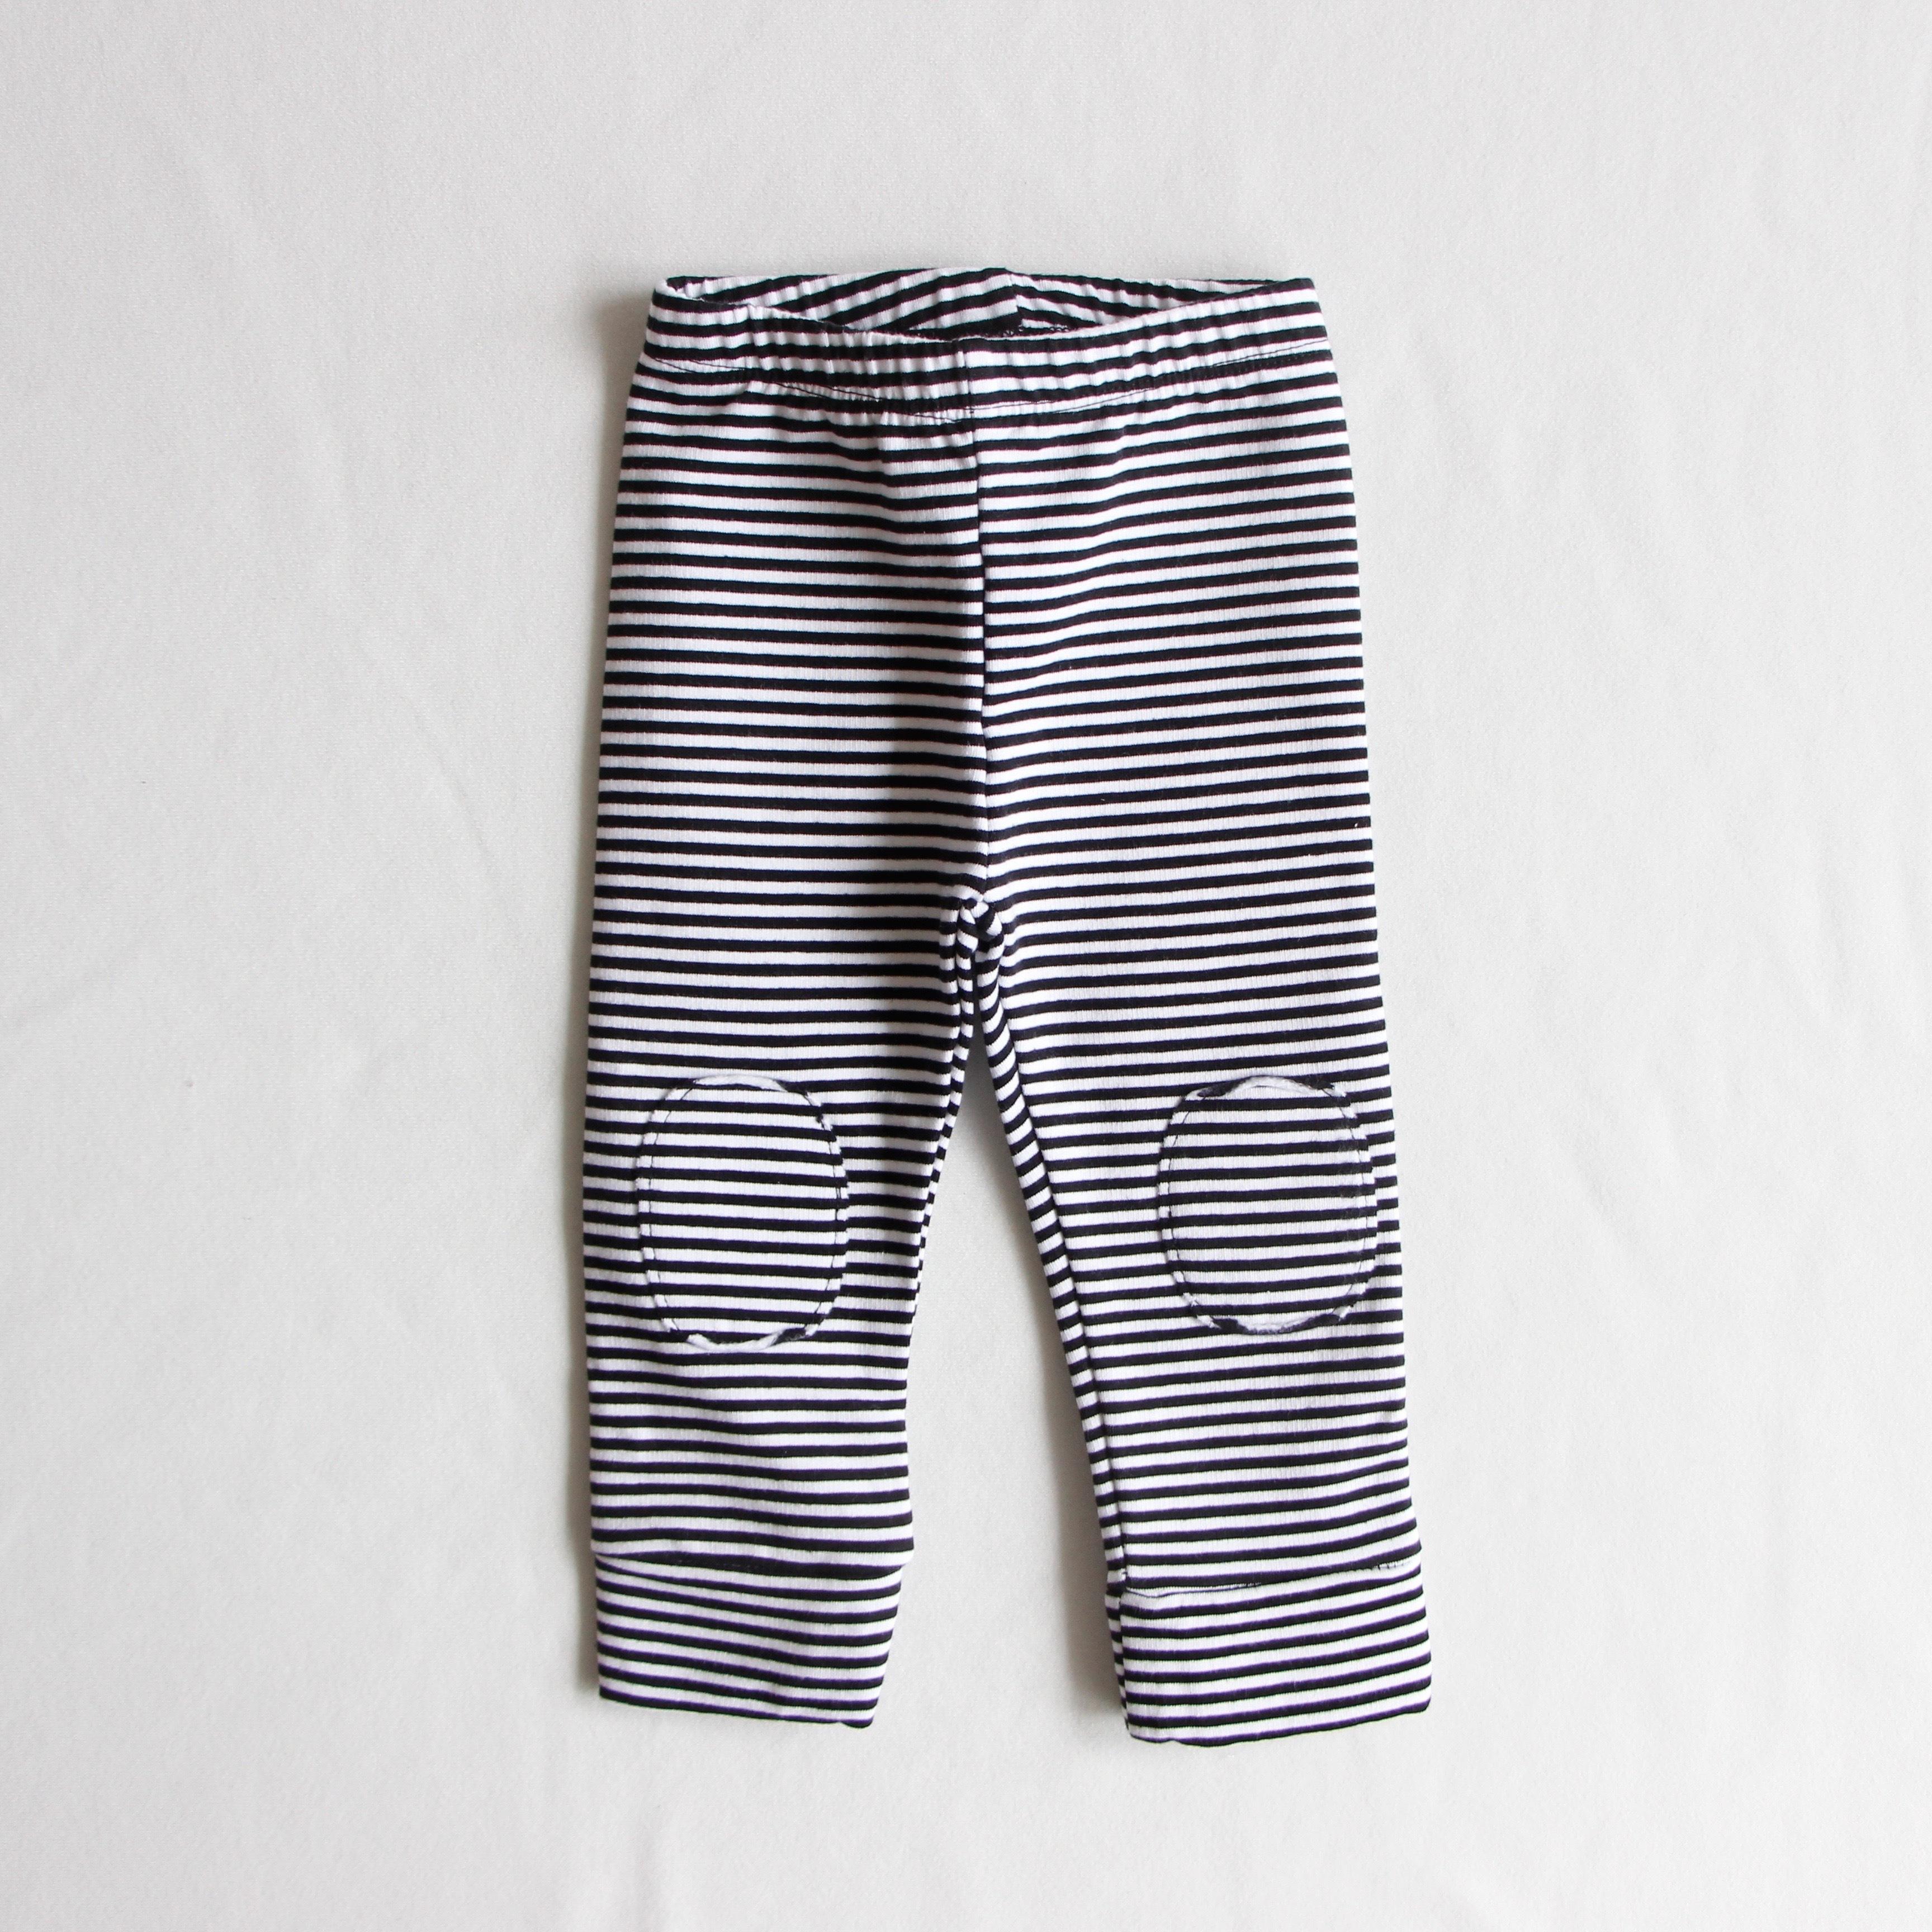 《MINGO.》Winter Legging / Stripes